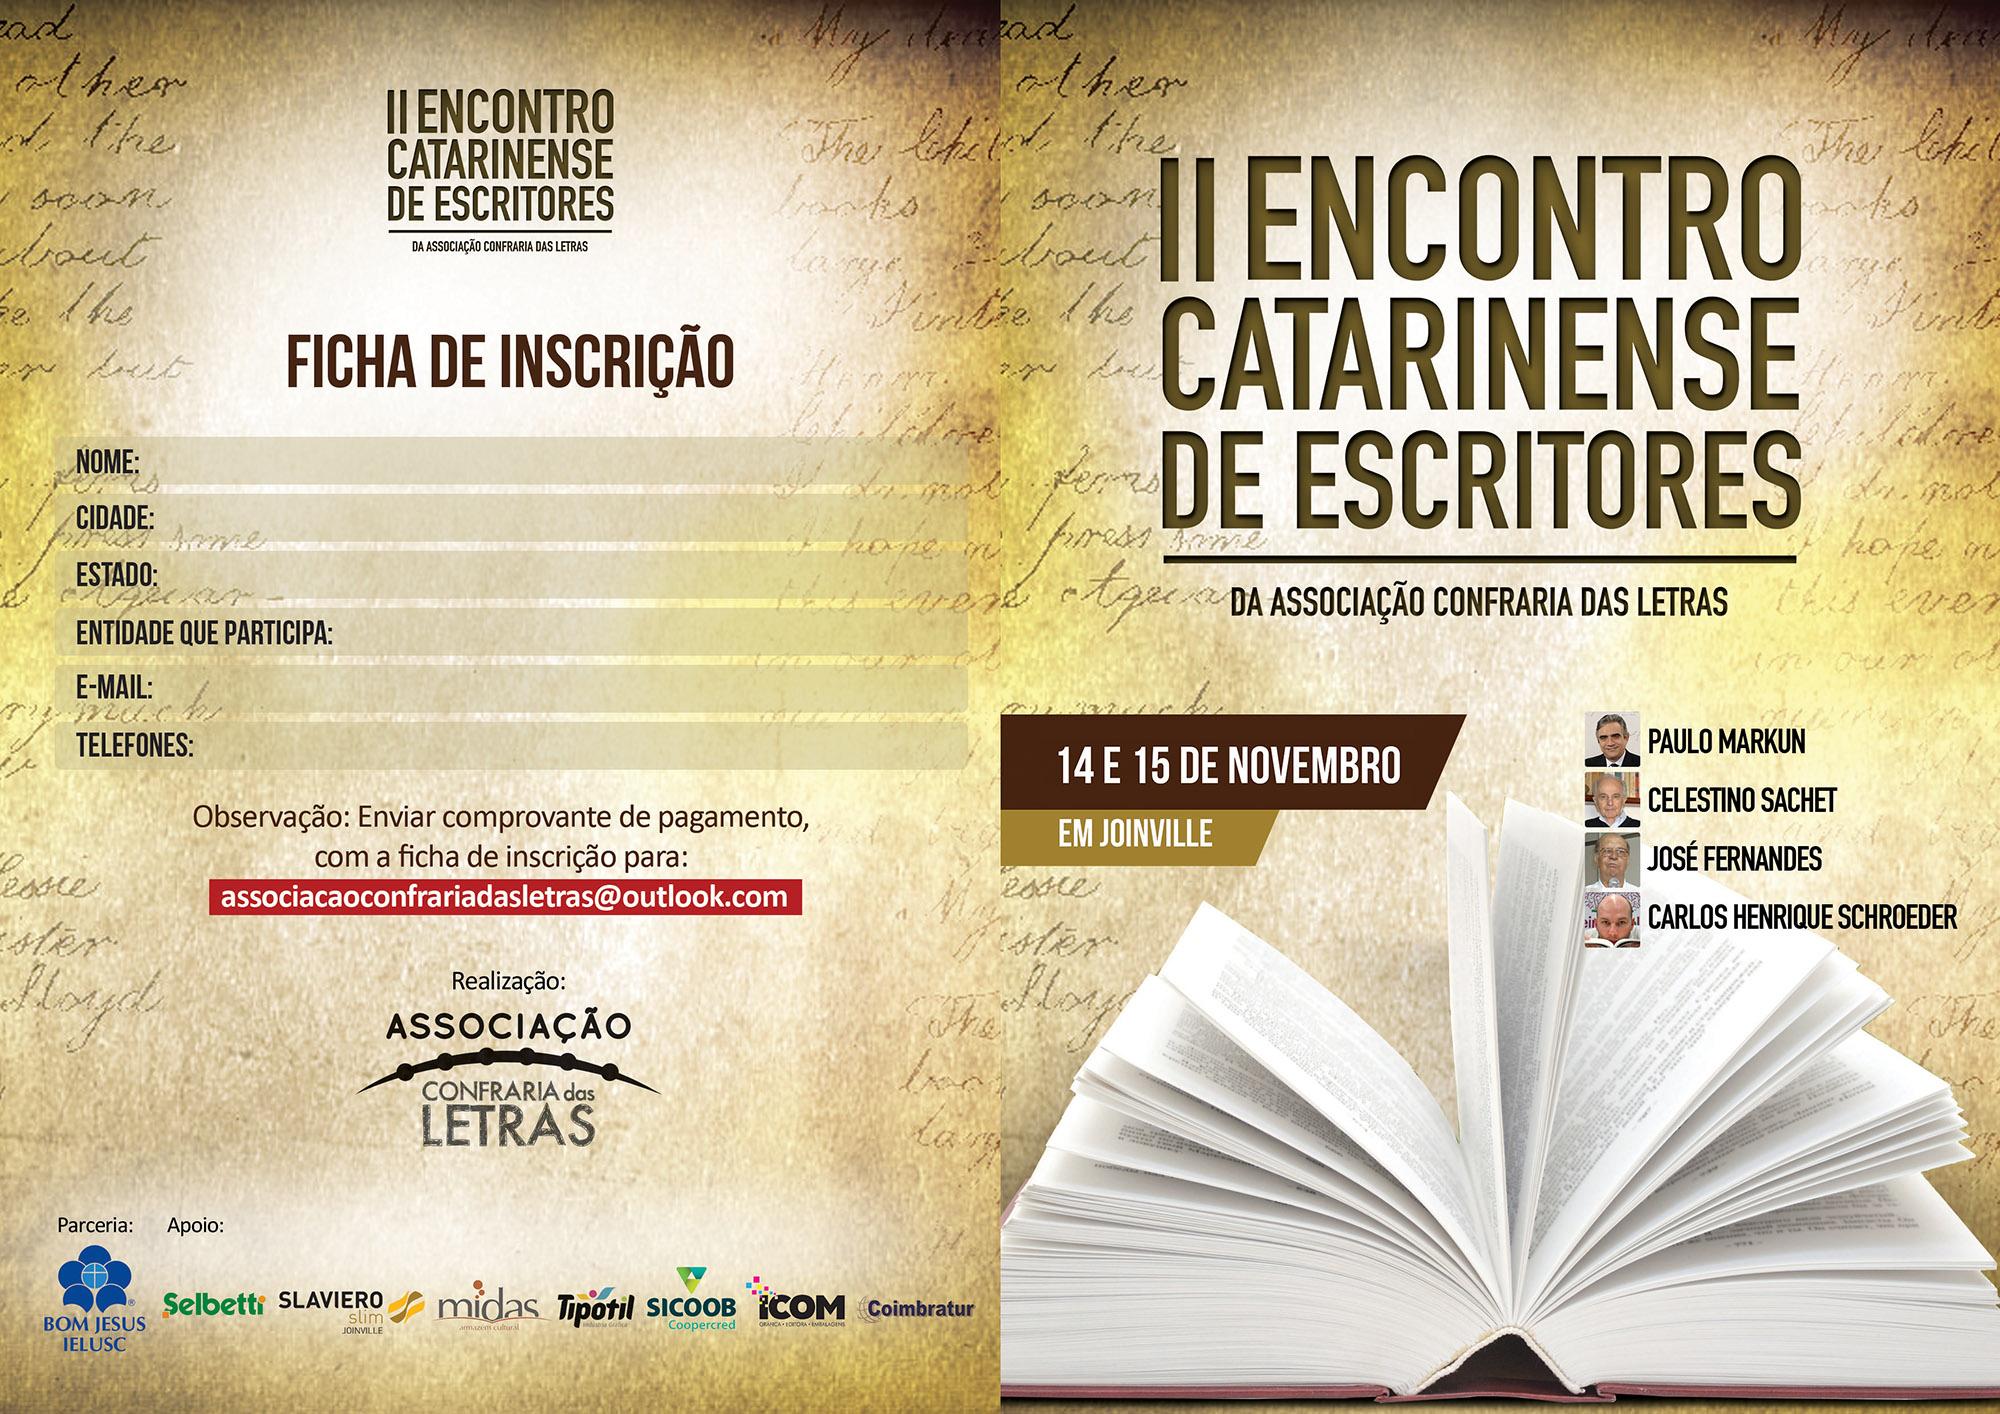 Literatura: Vem aí o II Encontro Catarinense de Escritores em novembro